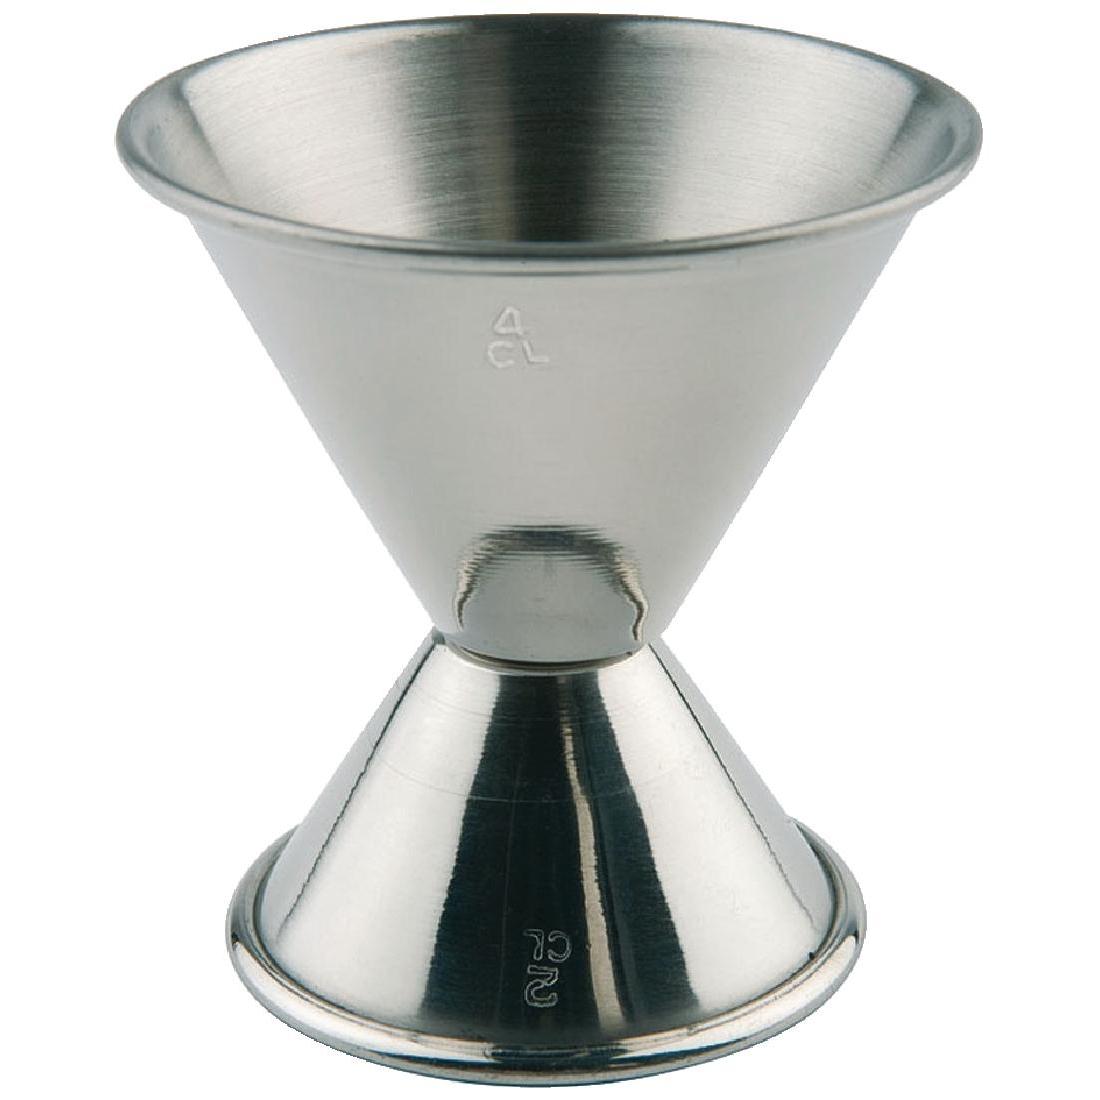 Mesure à cocktail jigger APS 20ml / 40ml